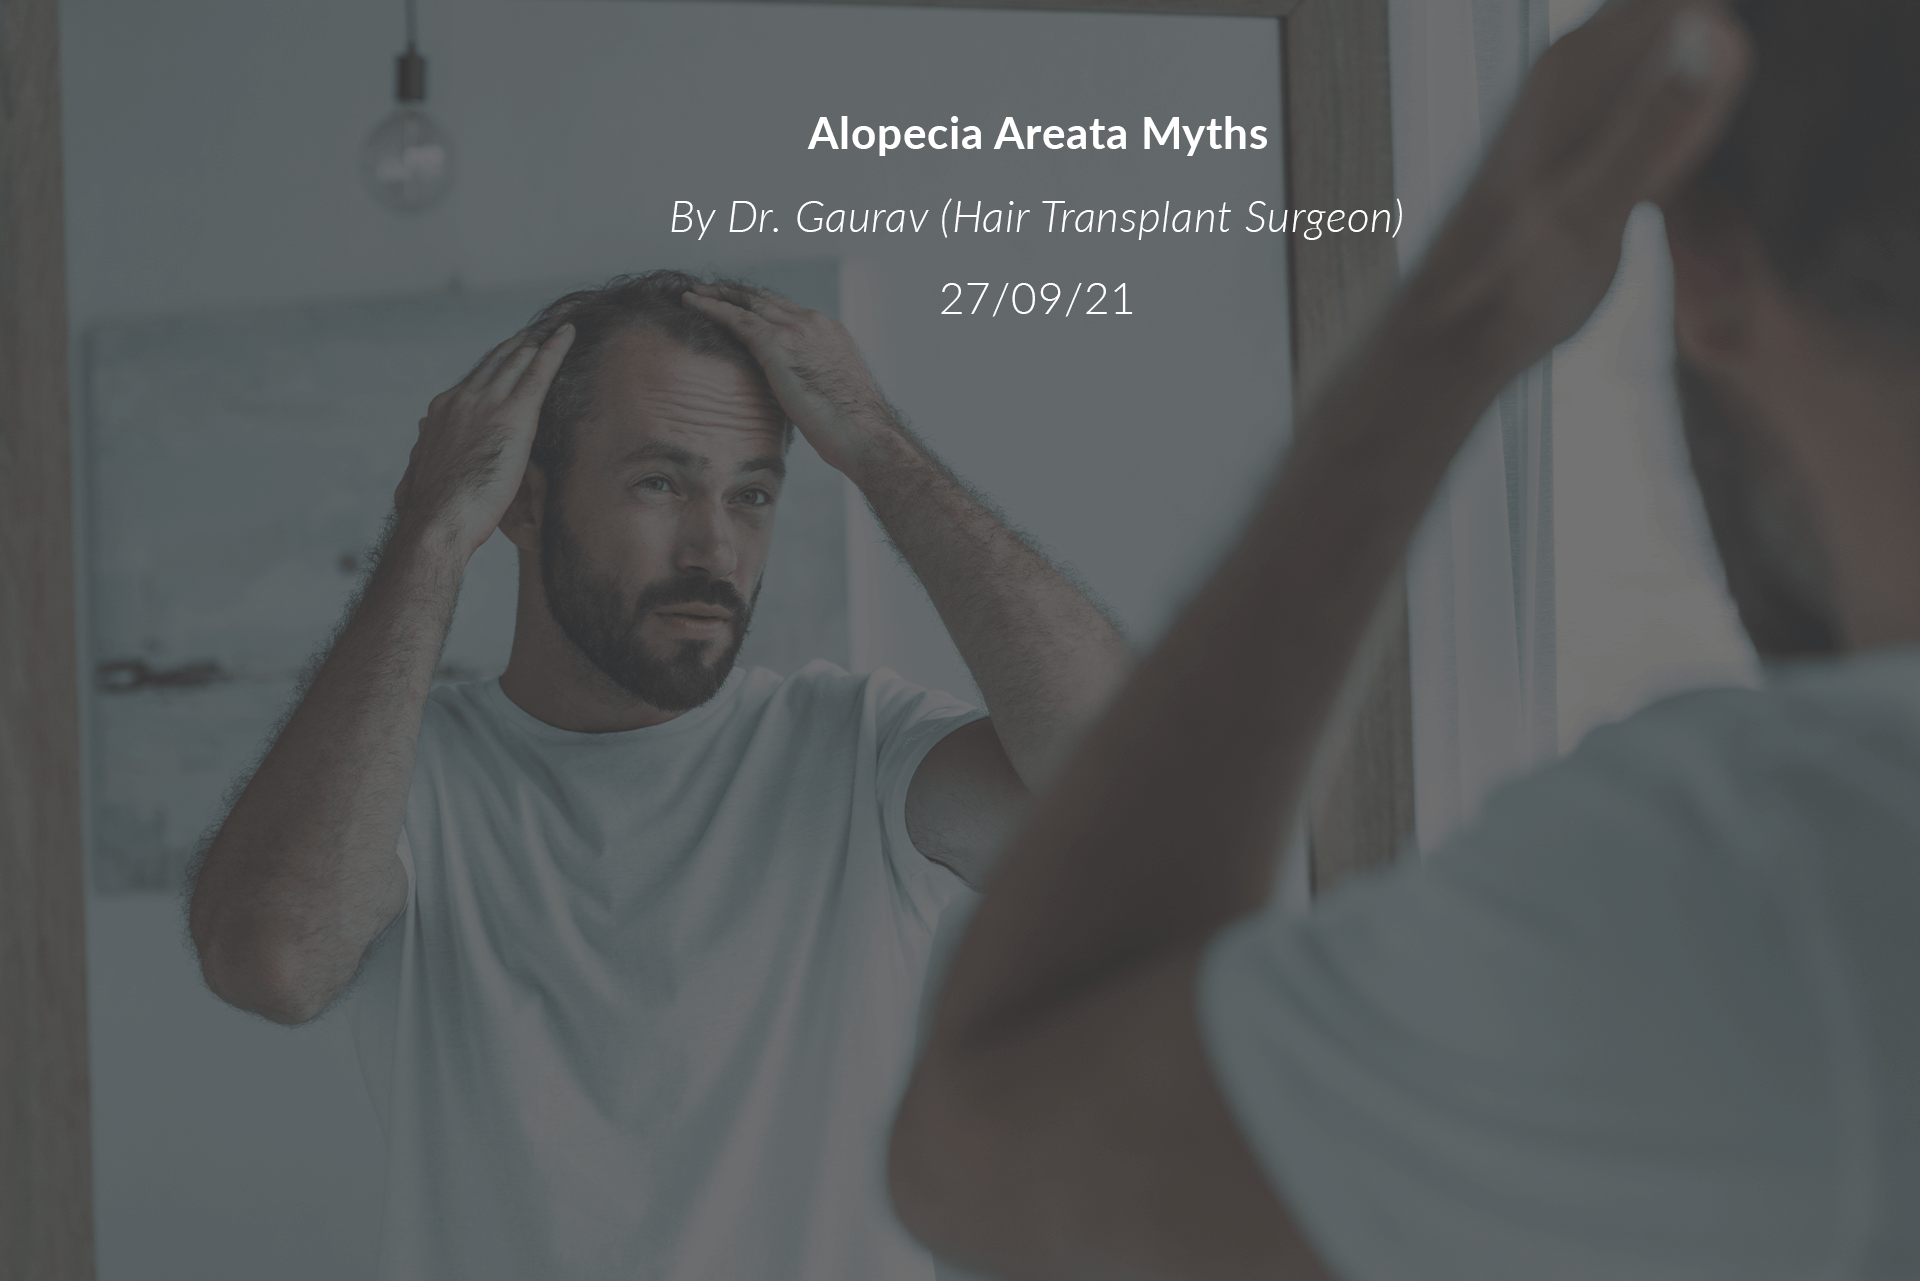 Alopecia Areata Myths